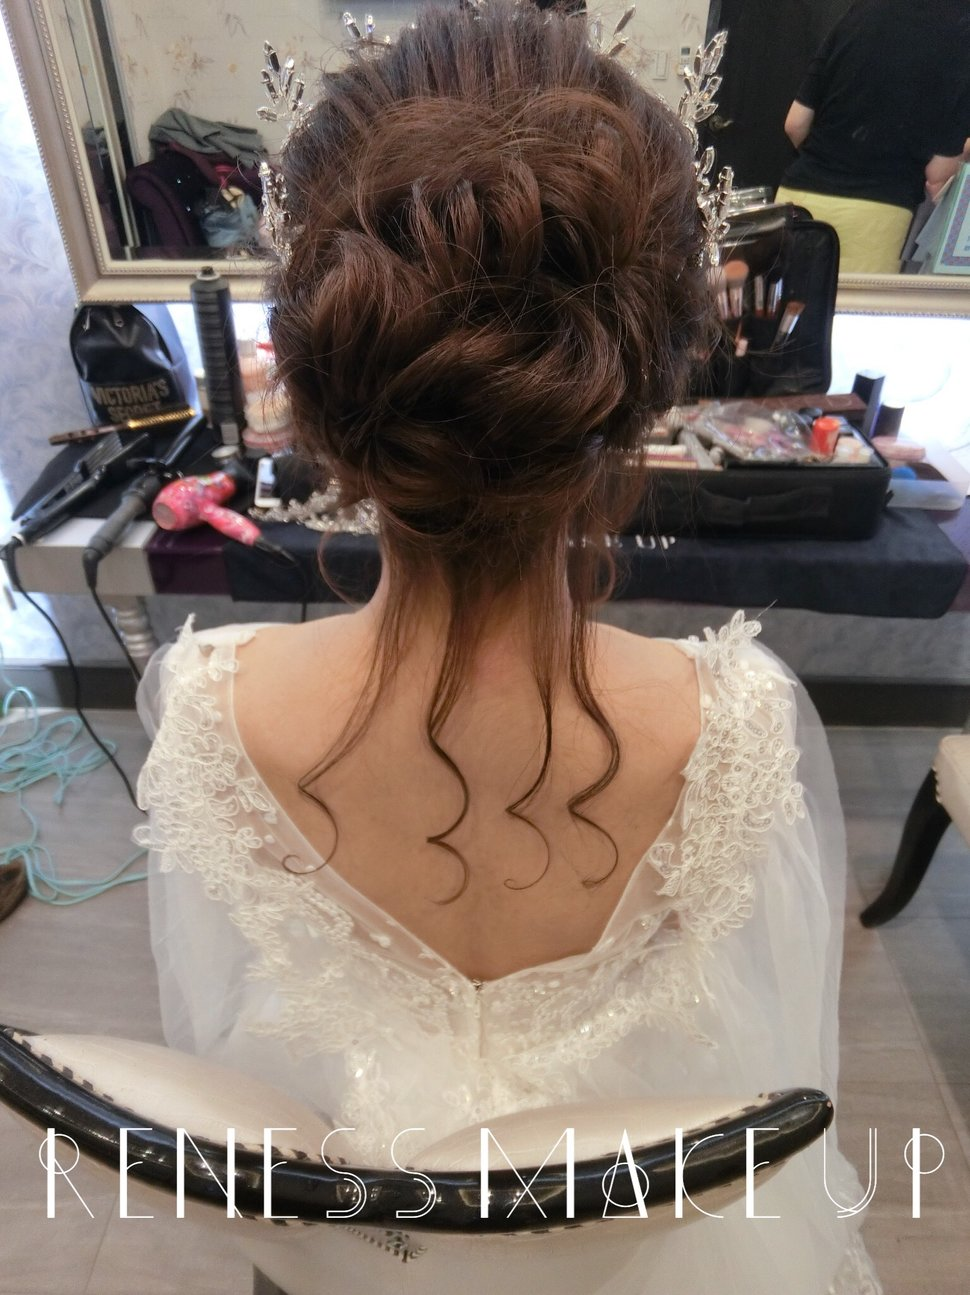 250AD3CF-C410-4F49-80A0-E800EDE8A2D2 - Reness bridal makeup《結婚吧》